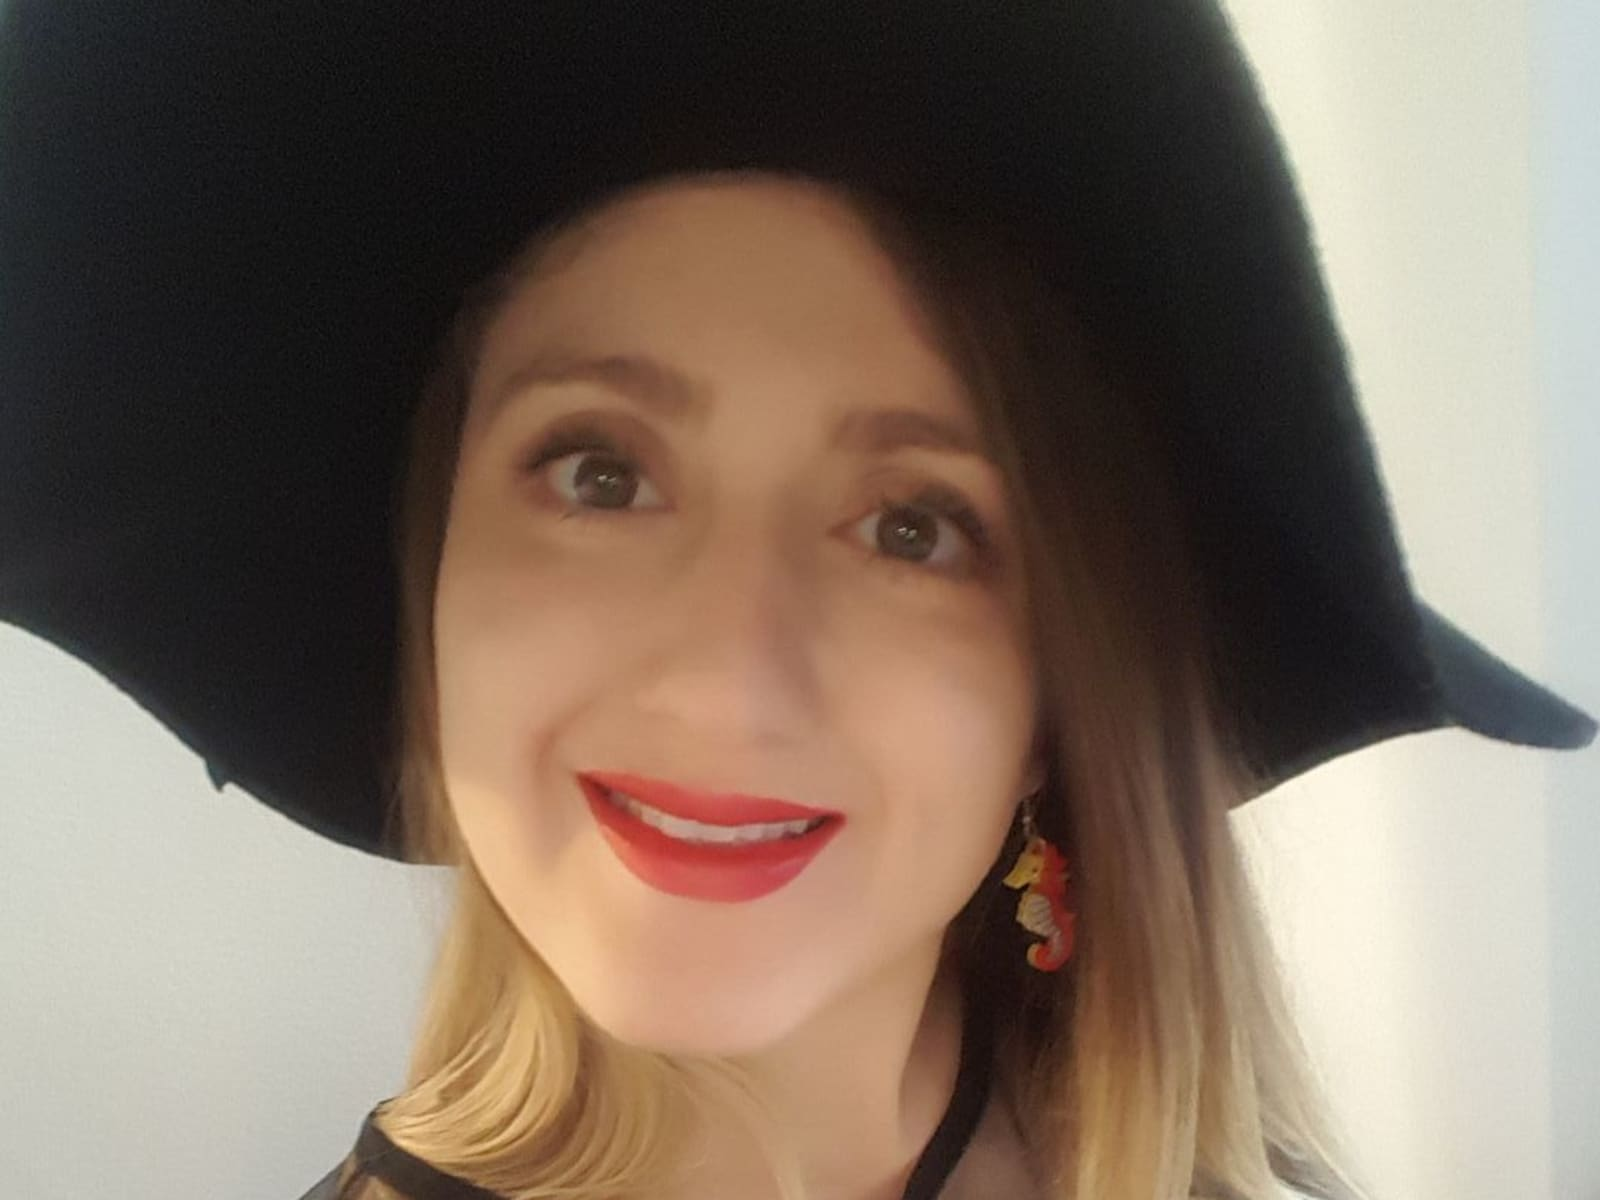 Helen from Brisbane, Queensland, Australia